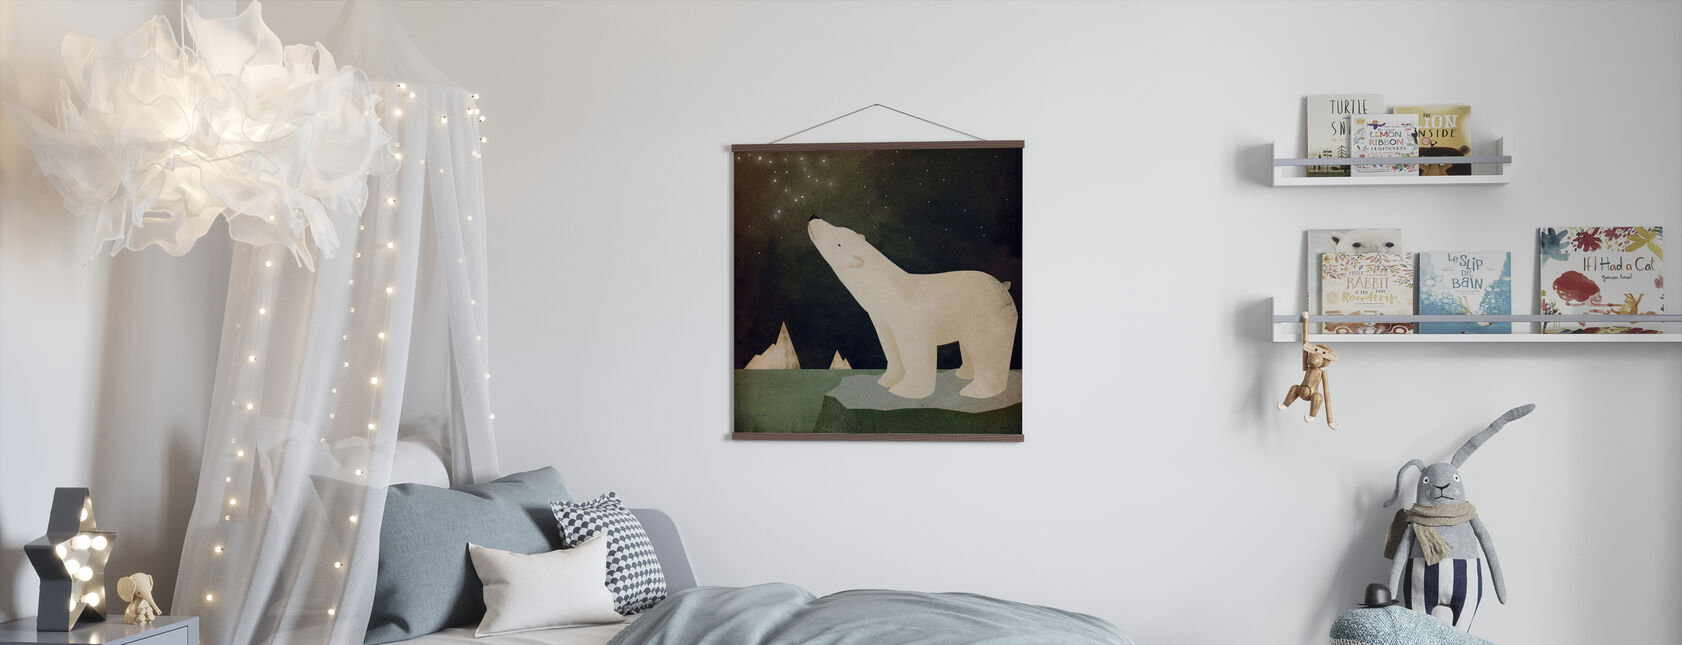 Sternbilder Eisbär - Poster - Kinderzimmer